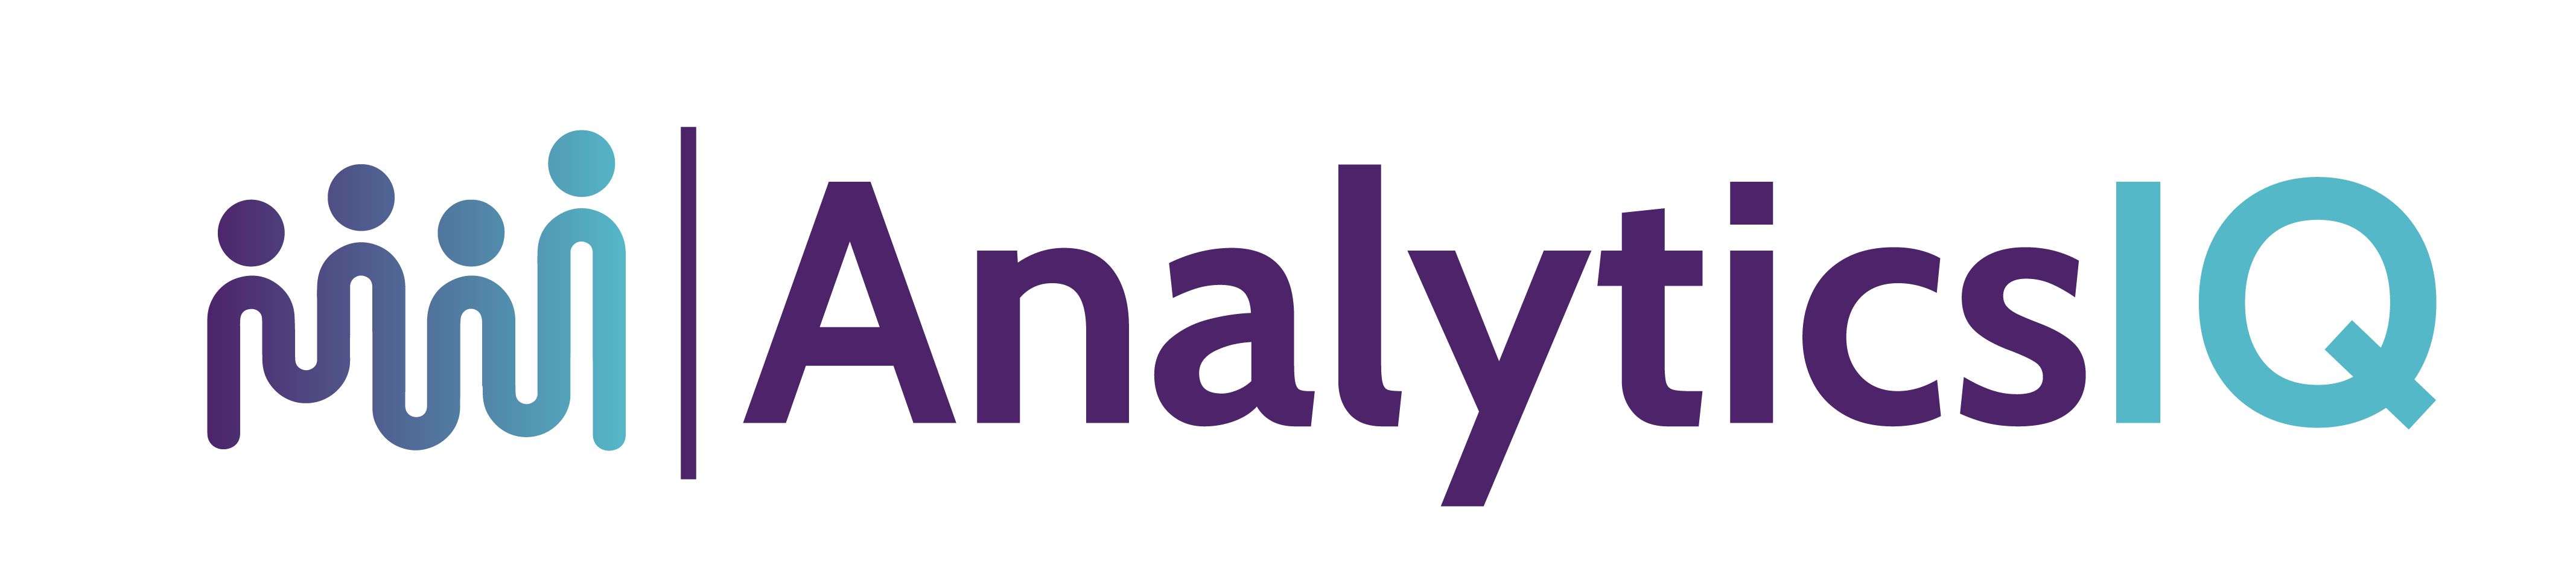 AnalyticsIQ logo